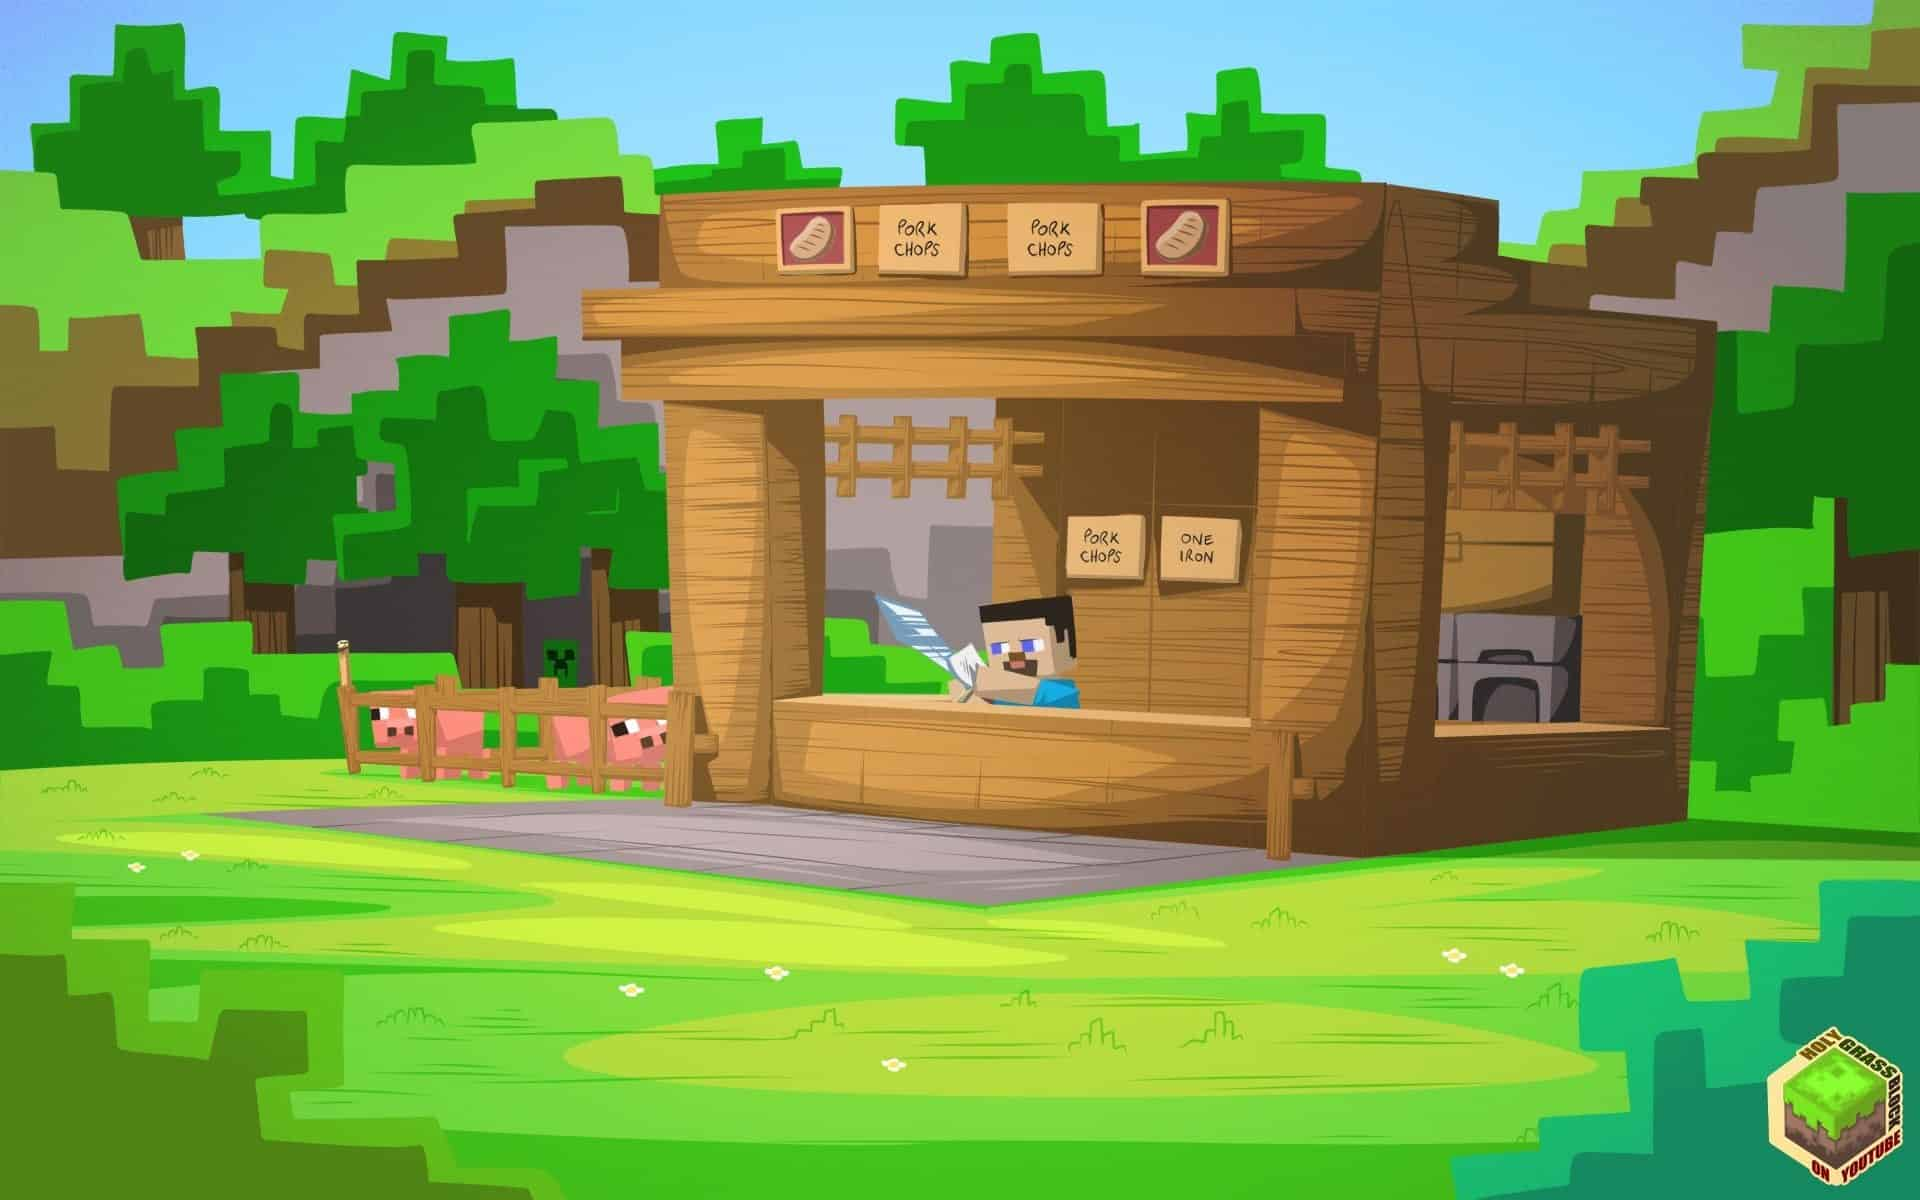 minecraft_pork_shop_by_mysticalpha-d83ryxo